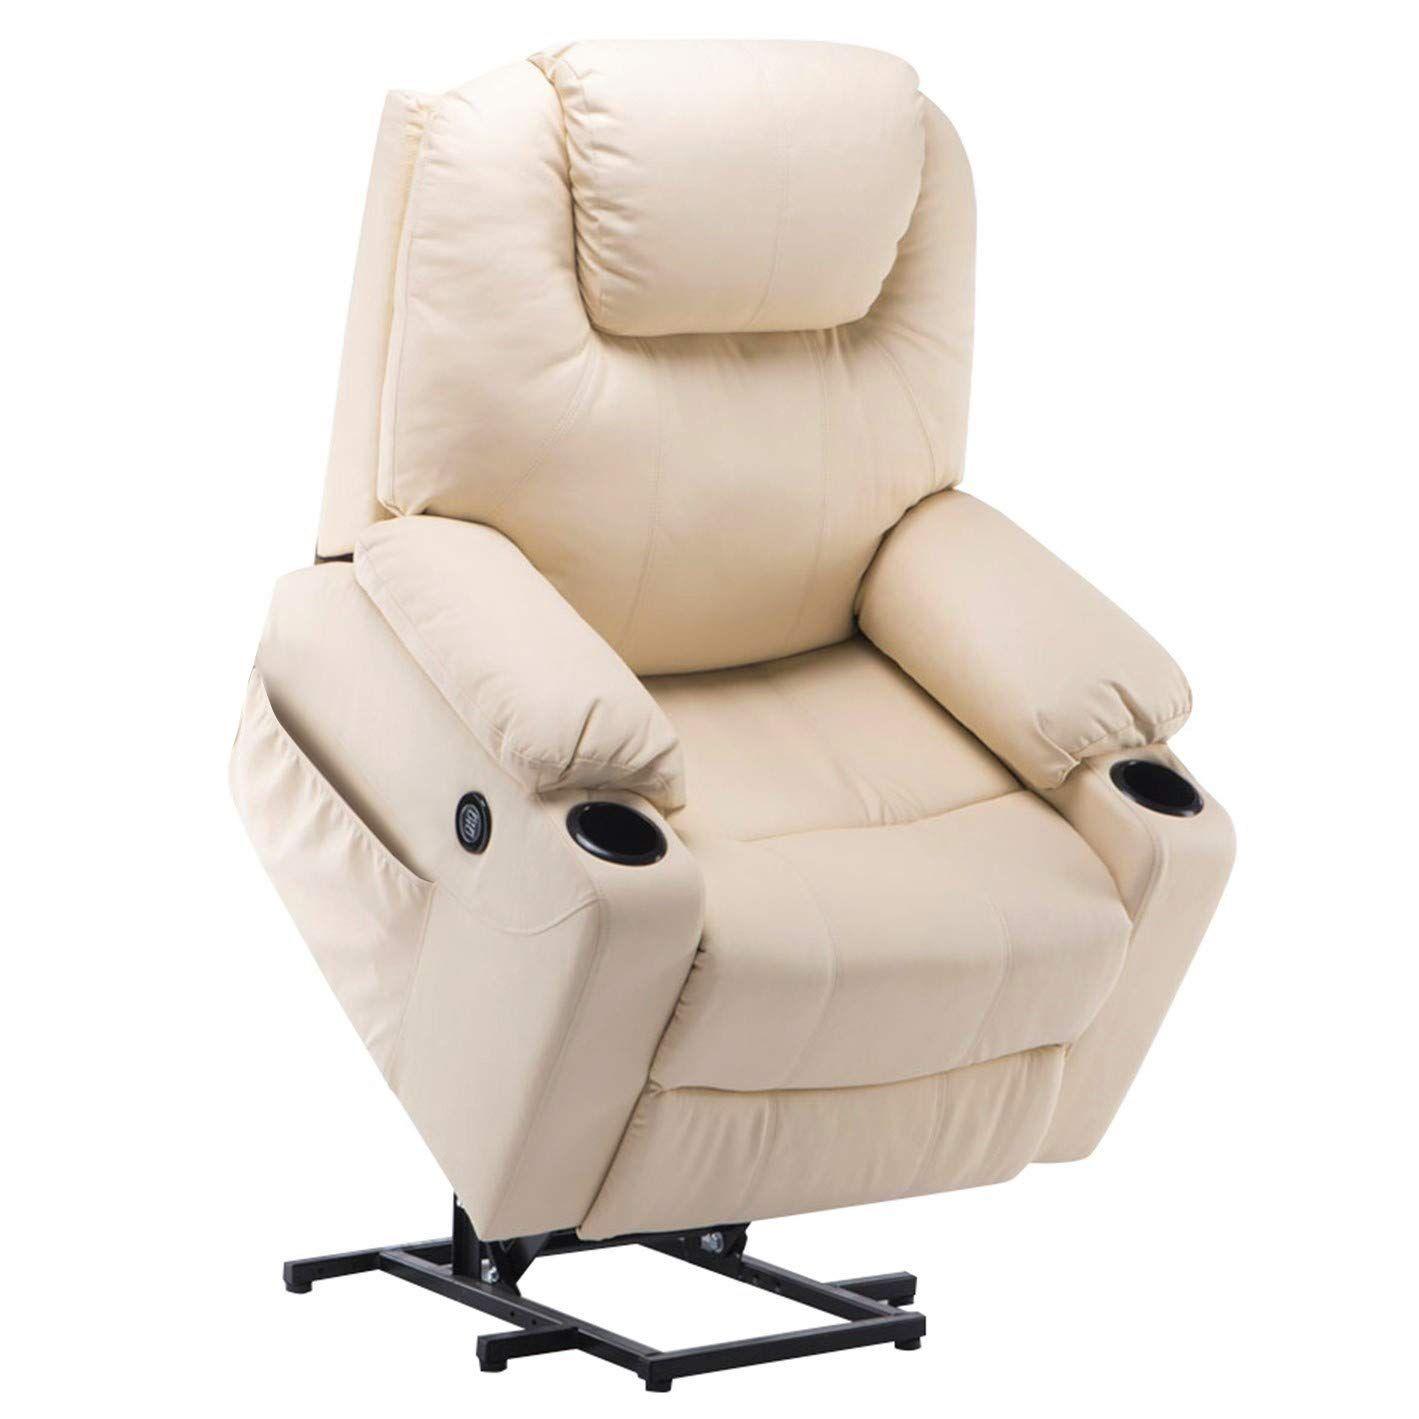 Outstanding Mcombo Electric Power Lift Massage Sofa Recliner Heated Sofa Short Links Chair Design For Home Short Linksinfo